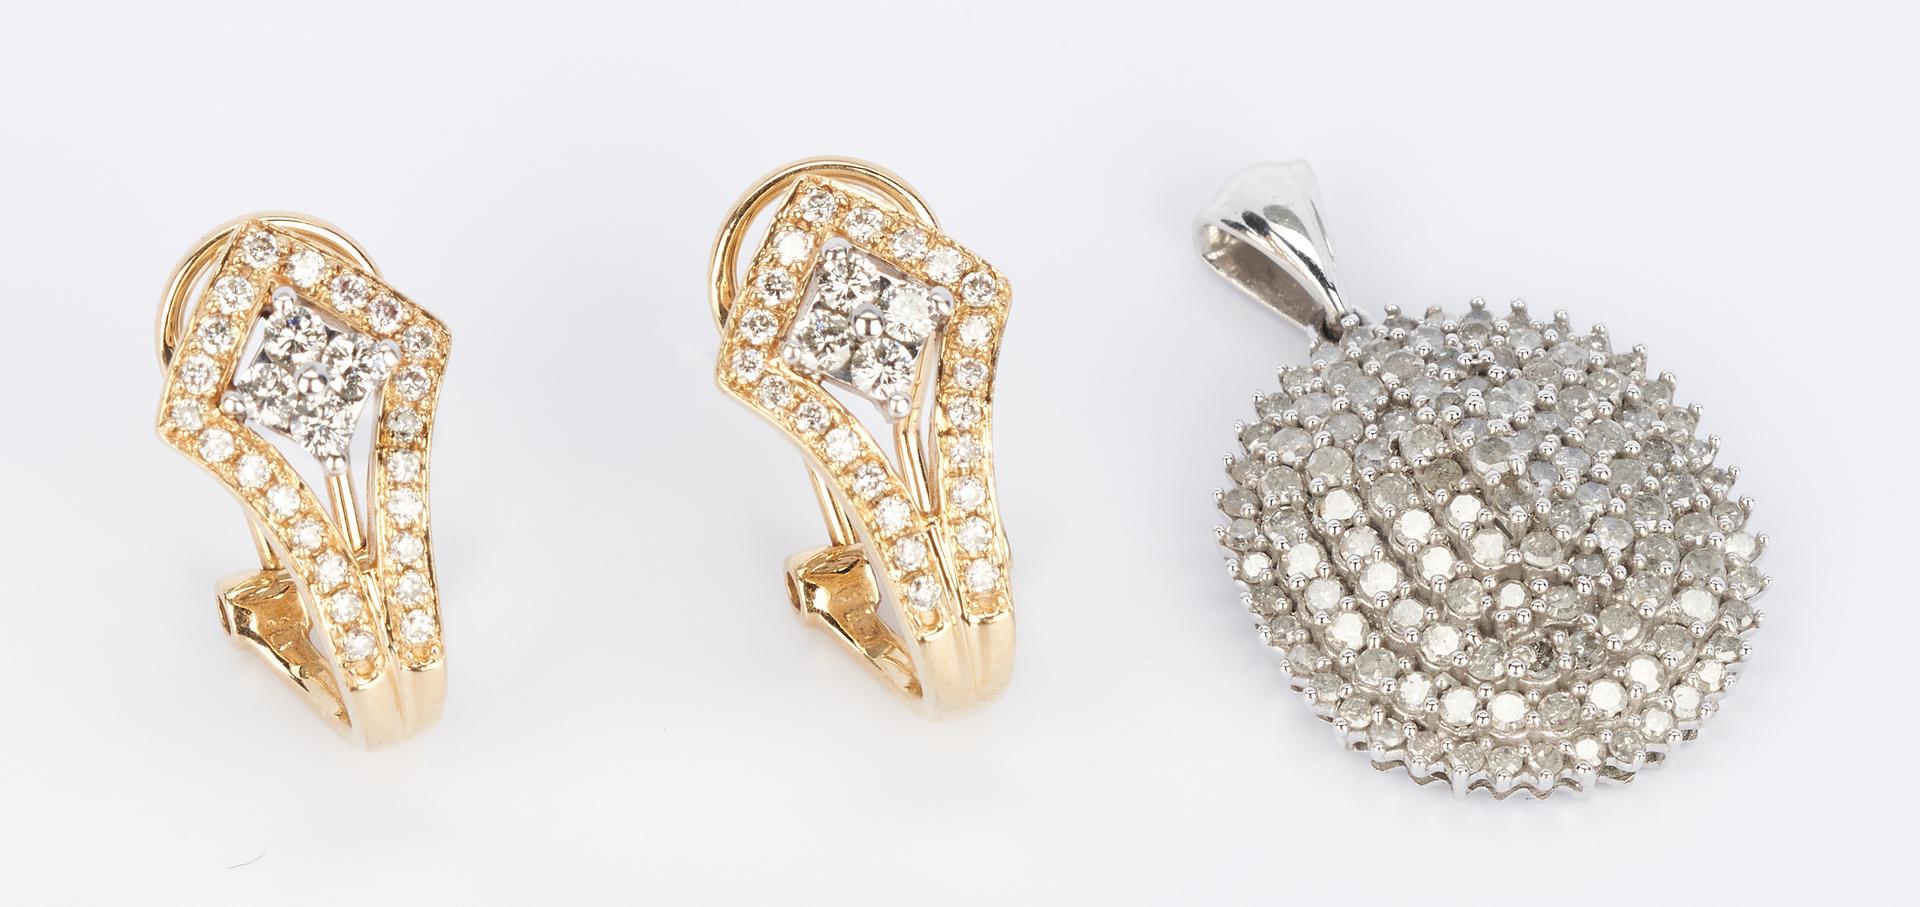 Lot 920: 14K Art Deco Style Diamond Earrings & Pave Diamond Pendant, 3 items